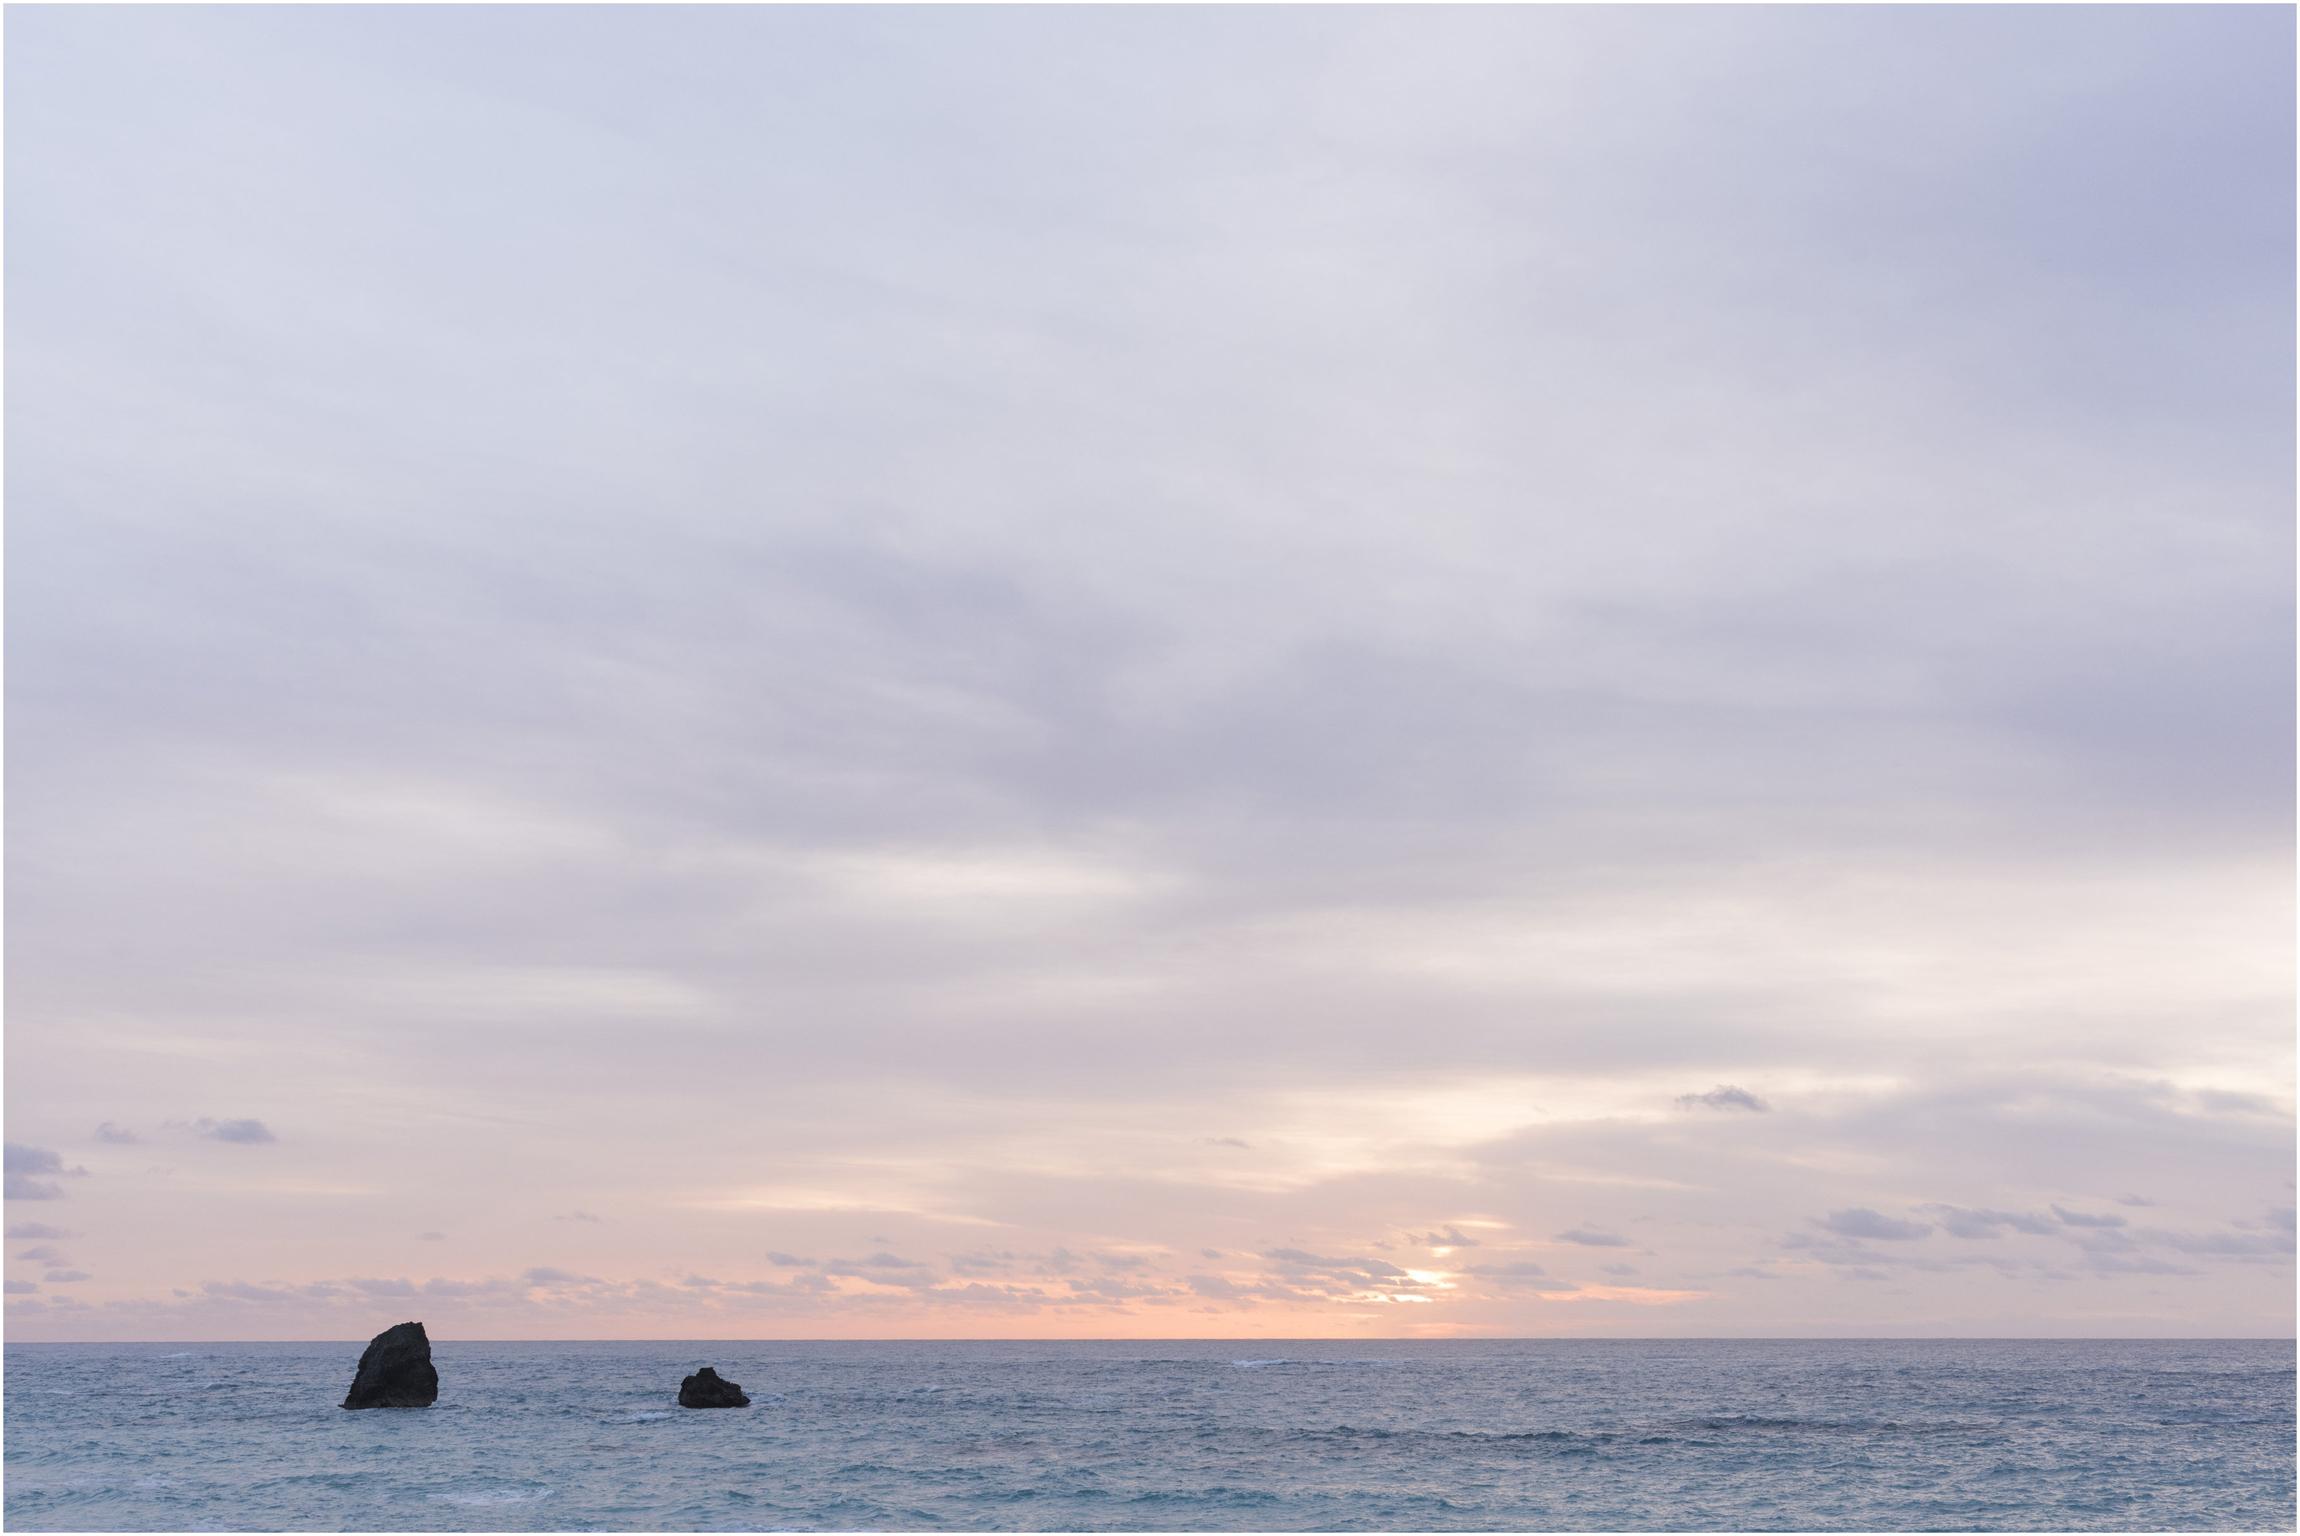 ©FianderFoto_Photo Tour_Beach_002.jpg